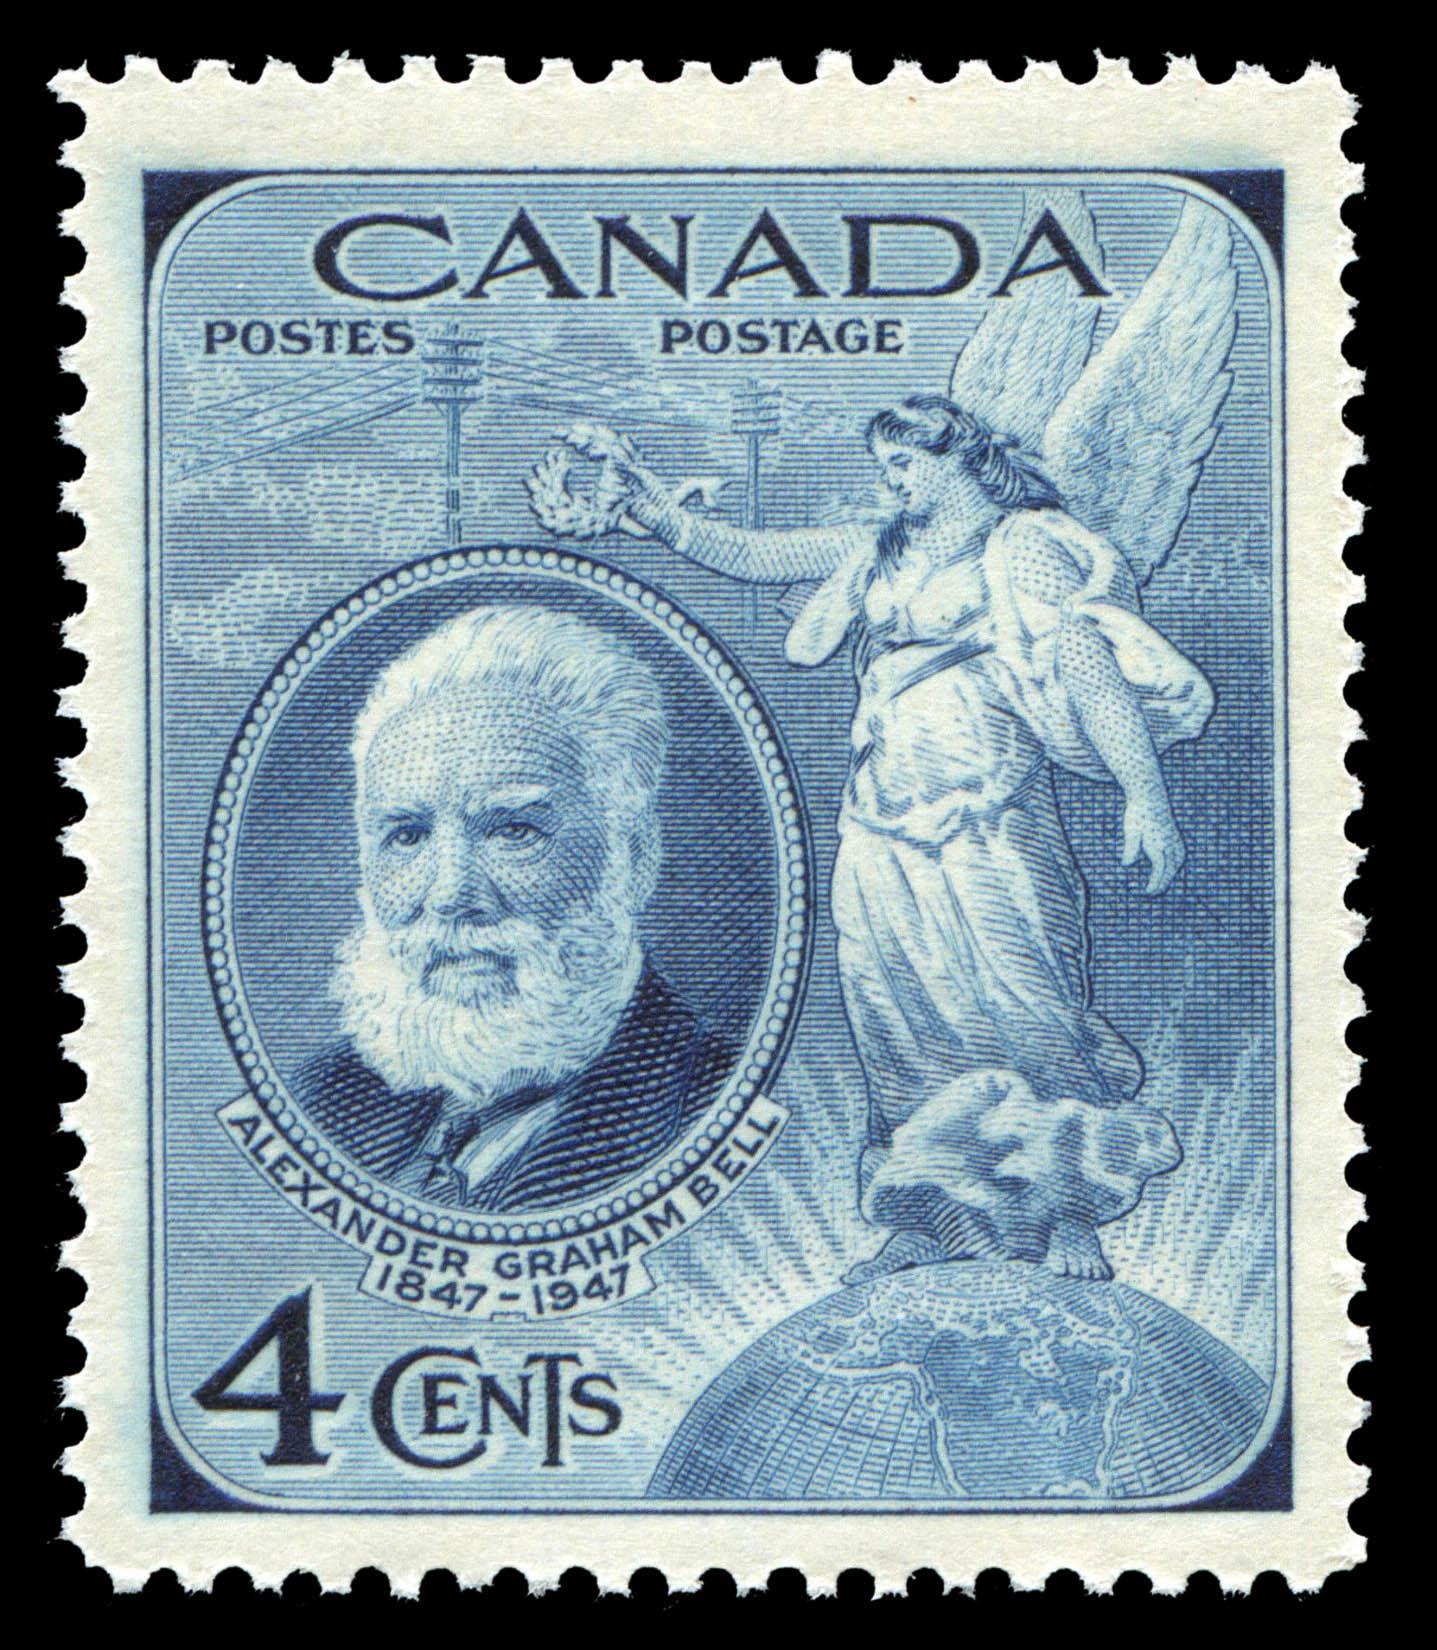 Alexander Graham Bell, 1847-1947 Canada Postage Stamp